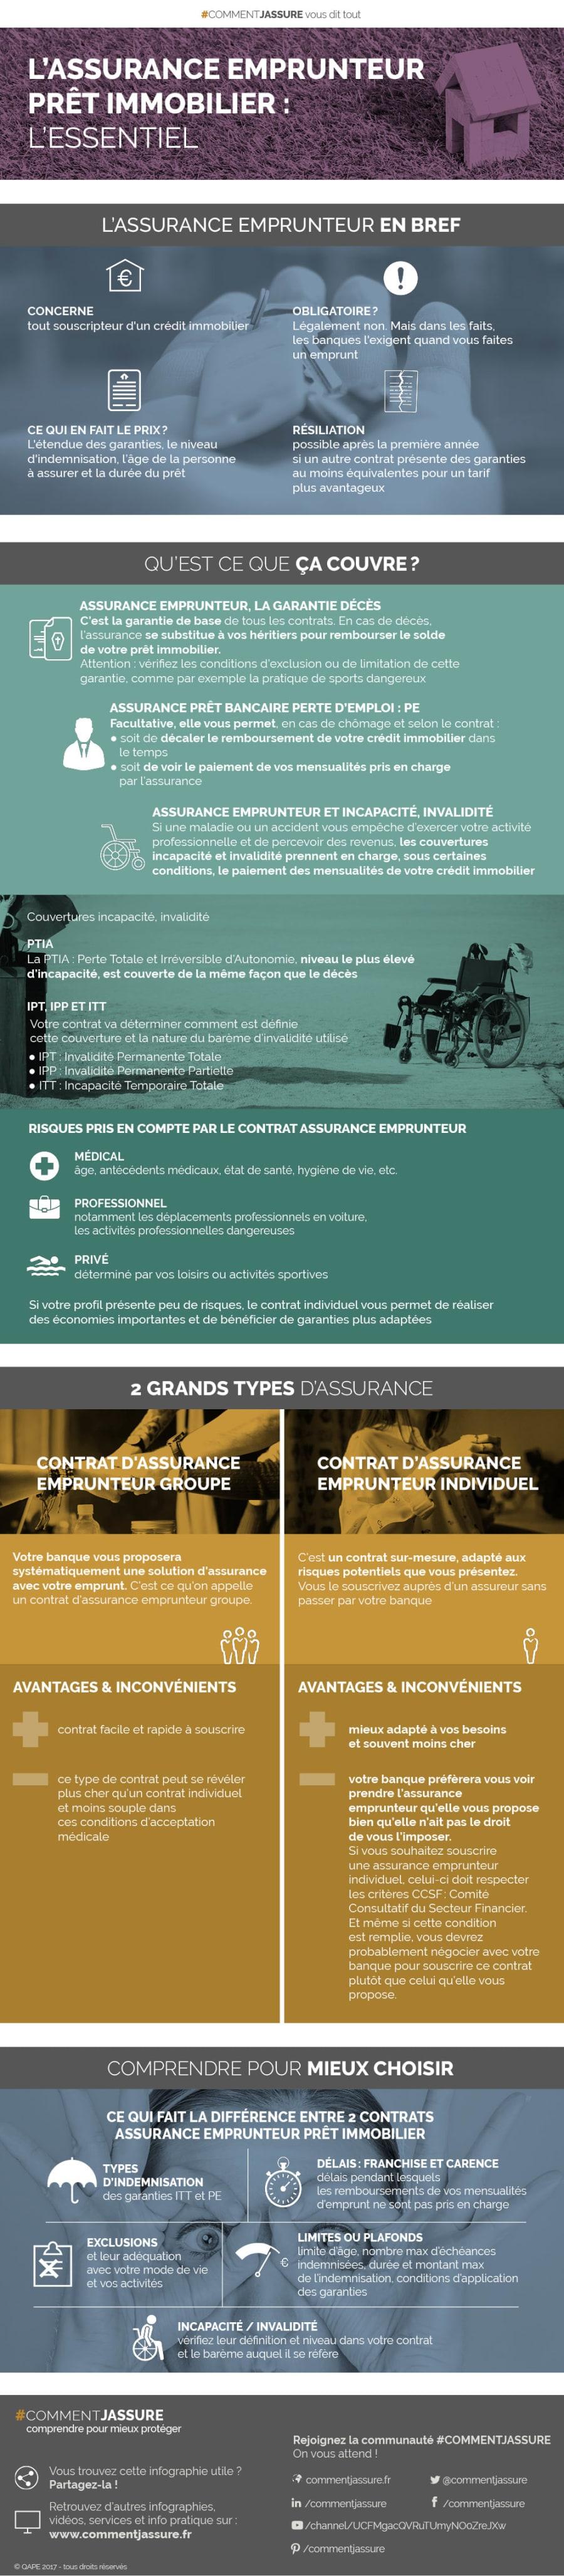 Infographie Assurance emprunteur prêt immobilier : l'essentiel assurance